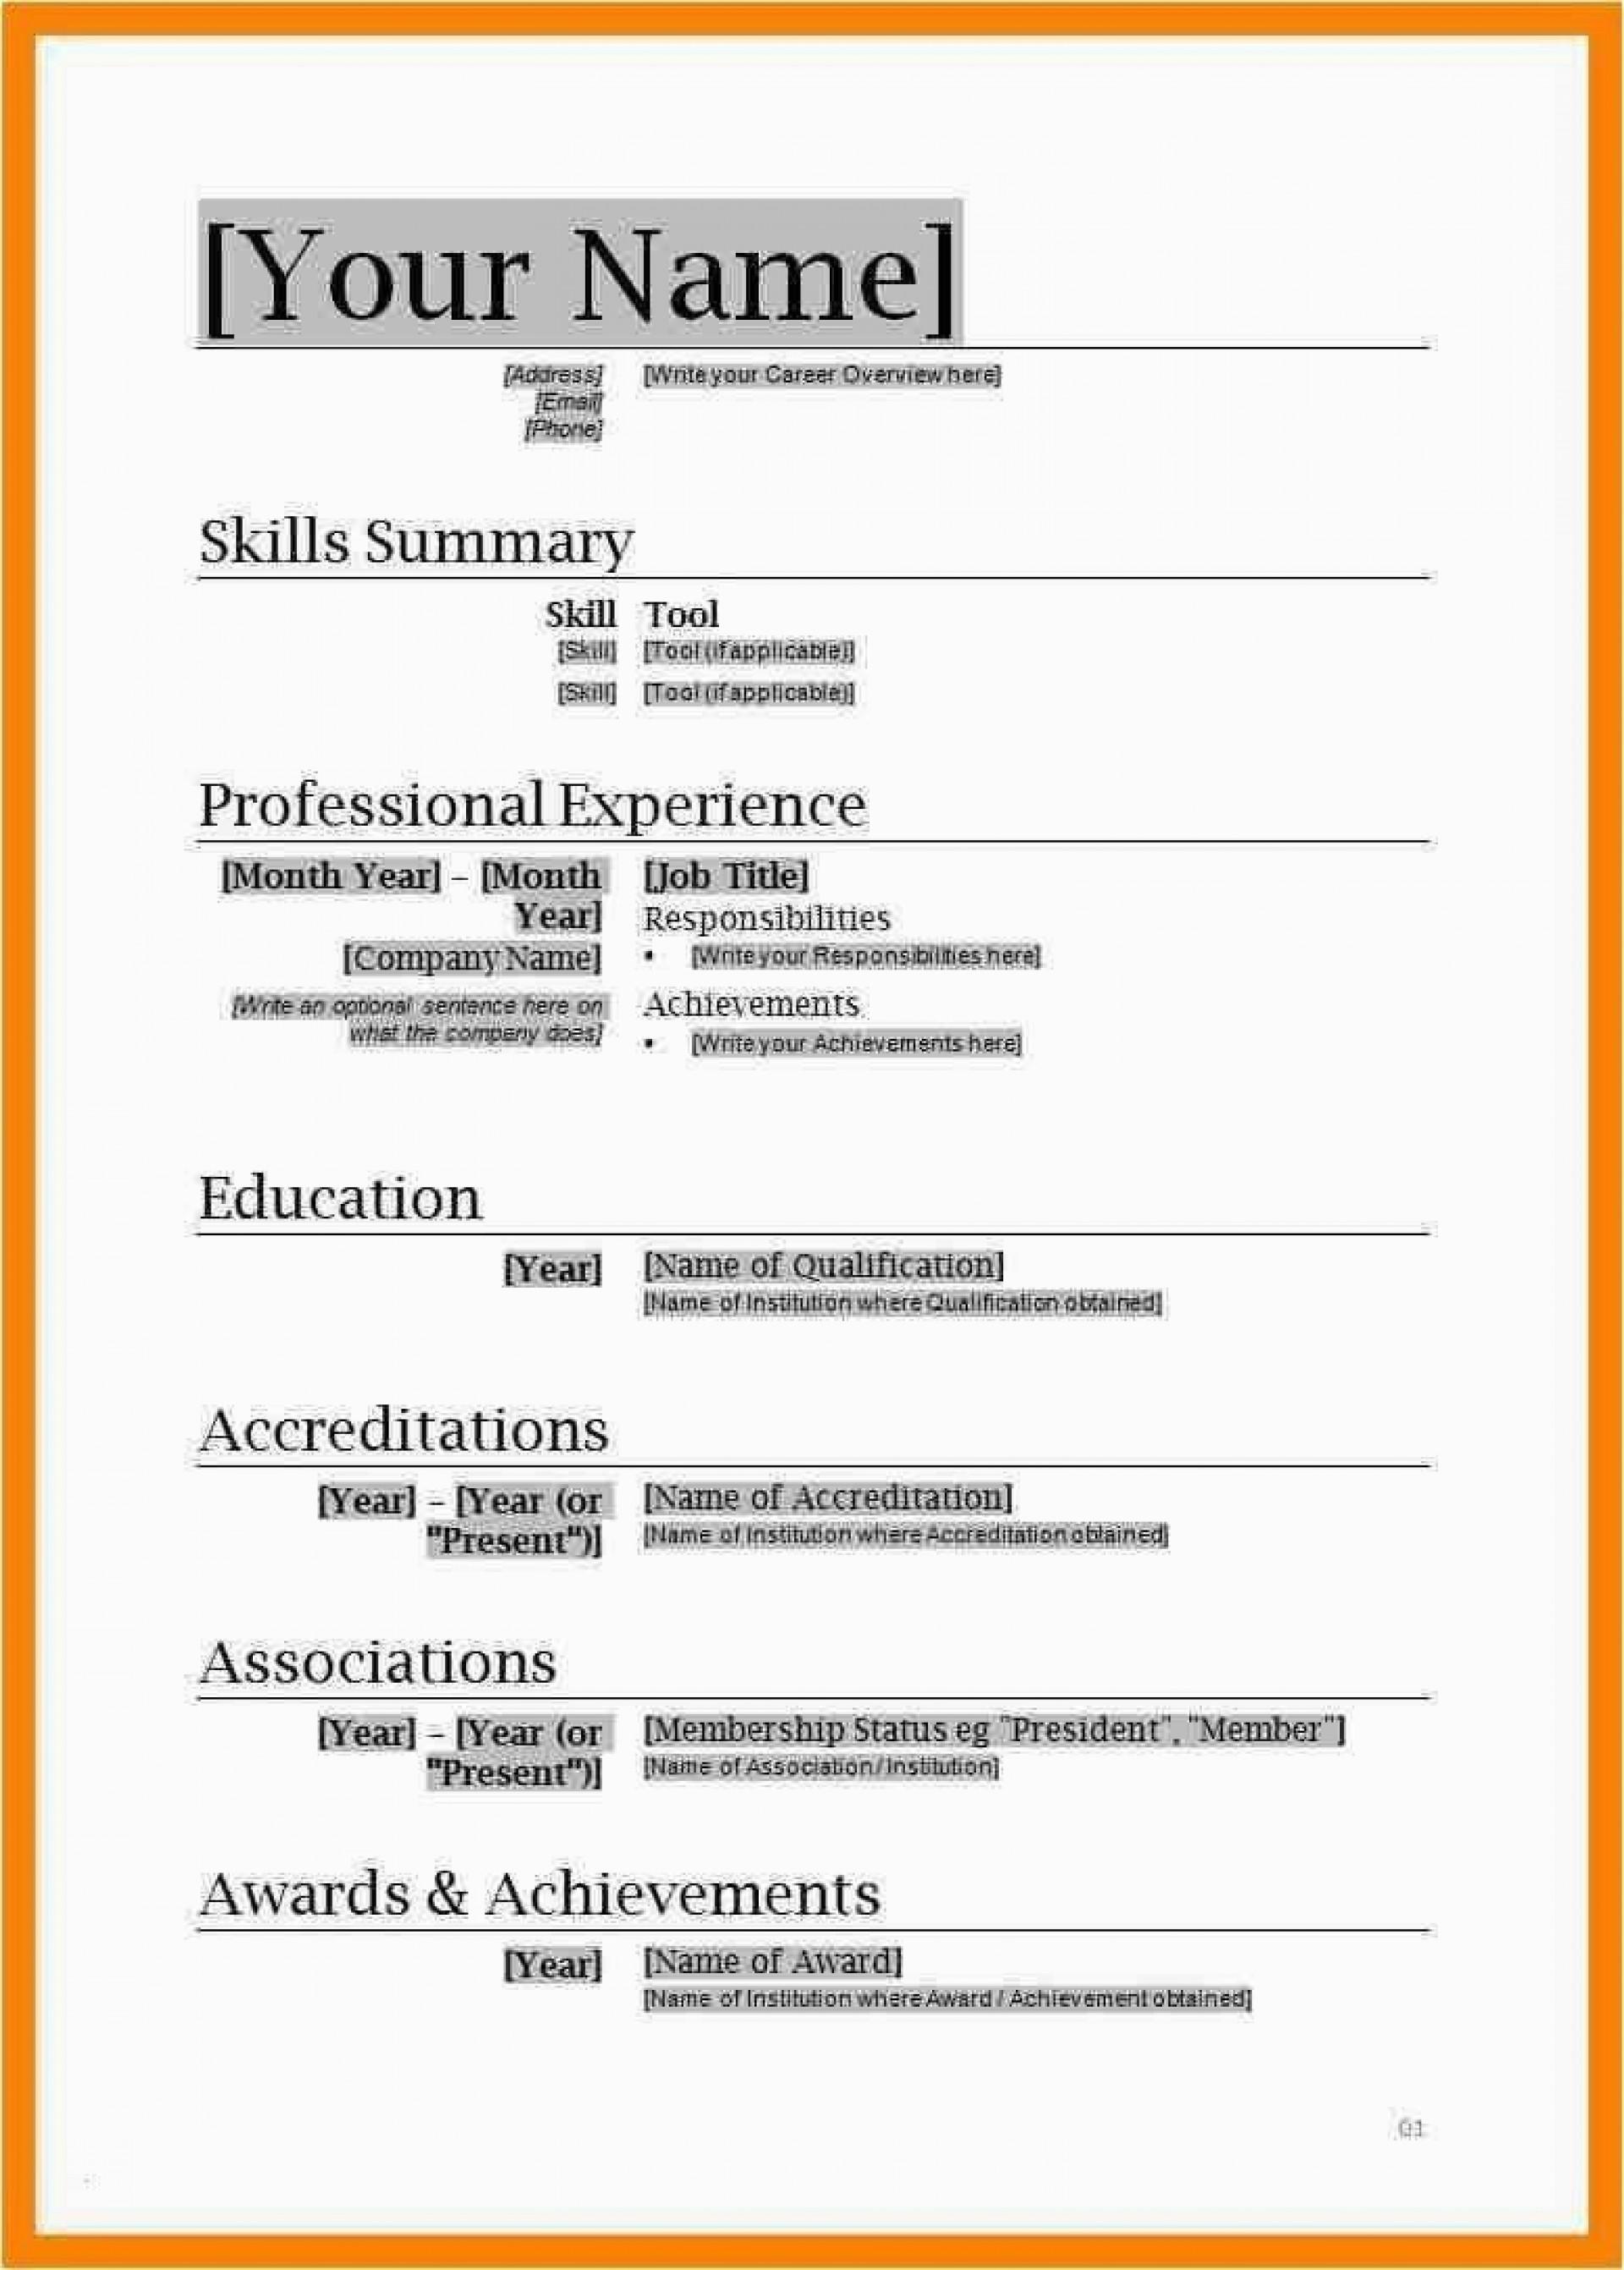 001 Unusual Free Simple Resume Template Microsoft Word Image 1920